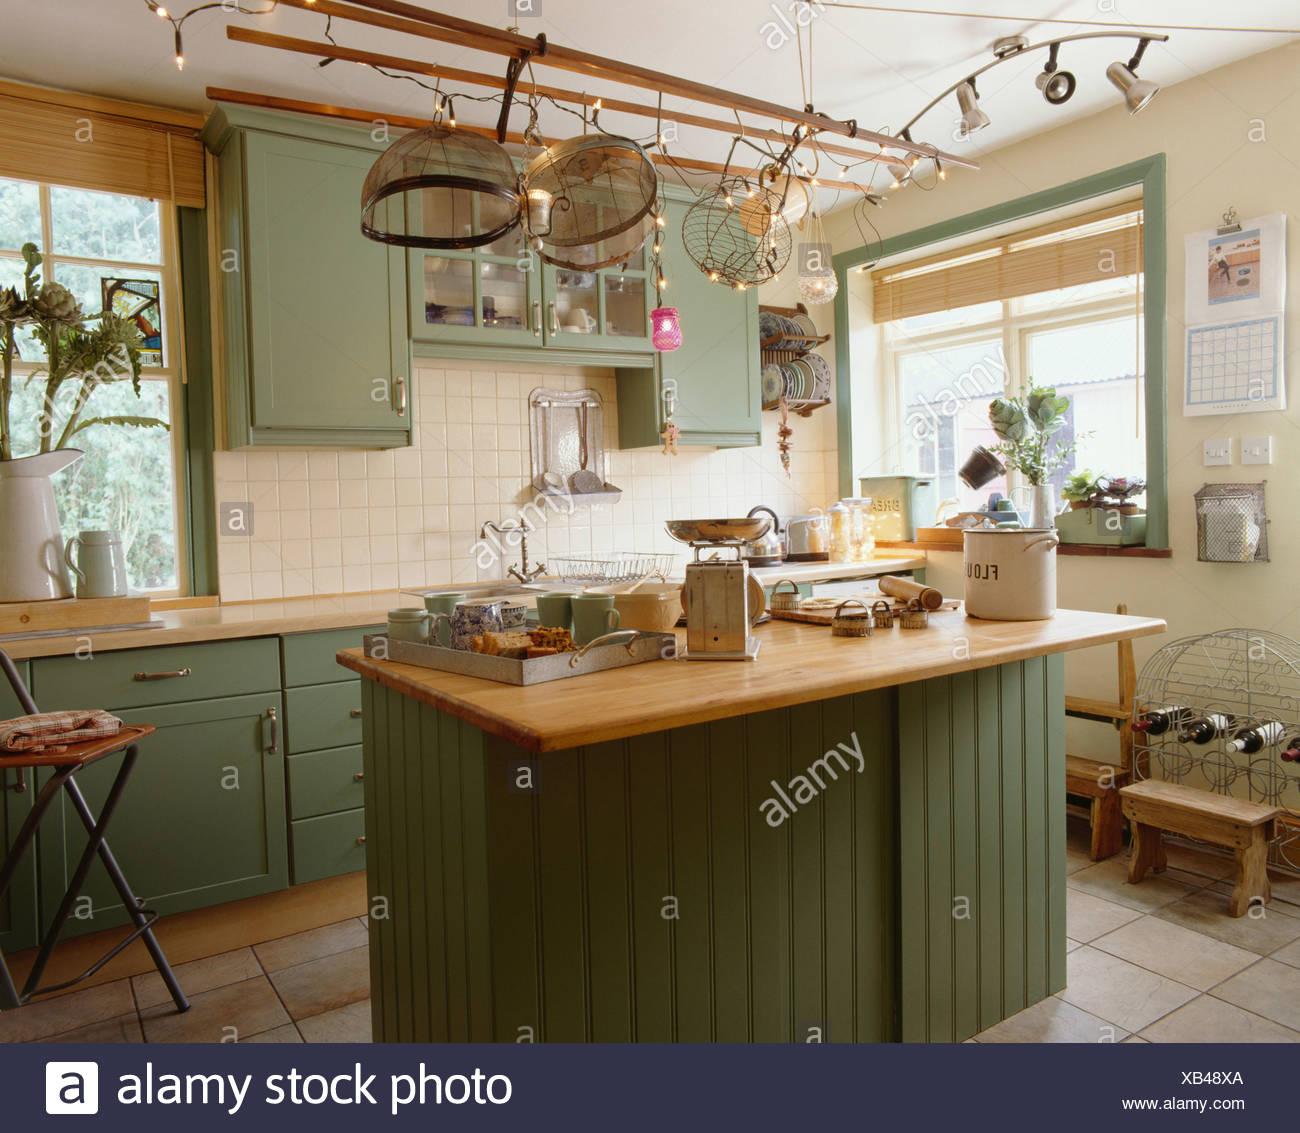 Kitchen Kitchens Interior Stockfotos & Kitchen Kitchens Interior ...